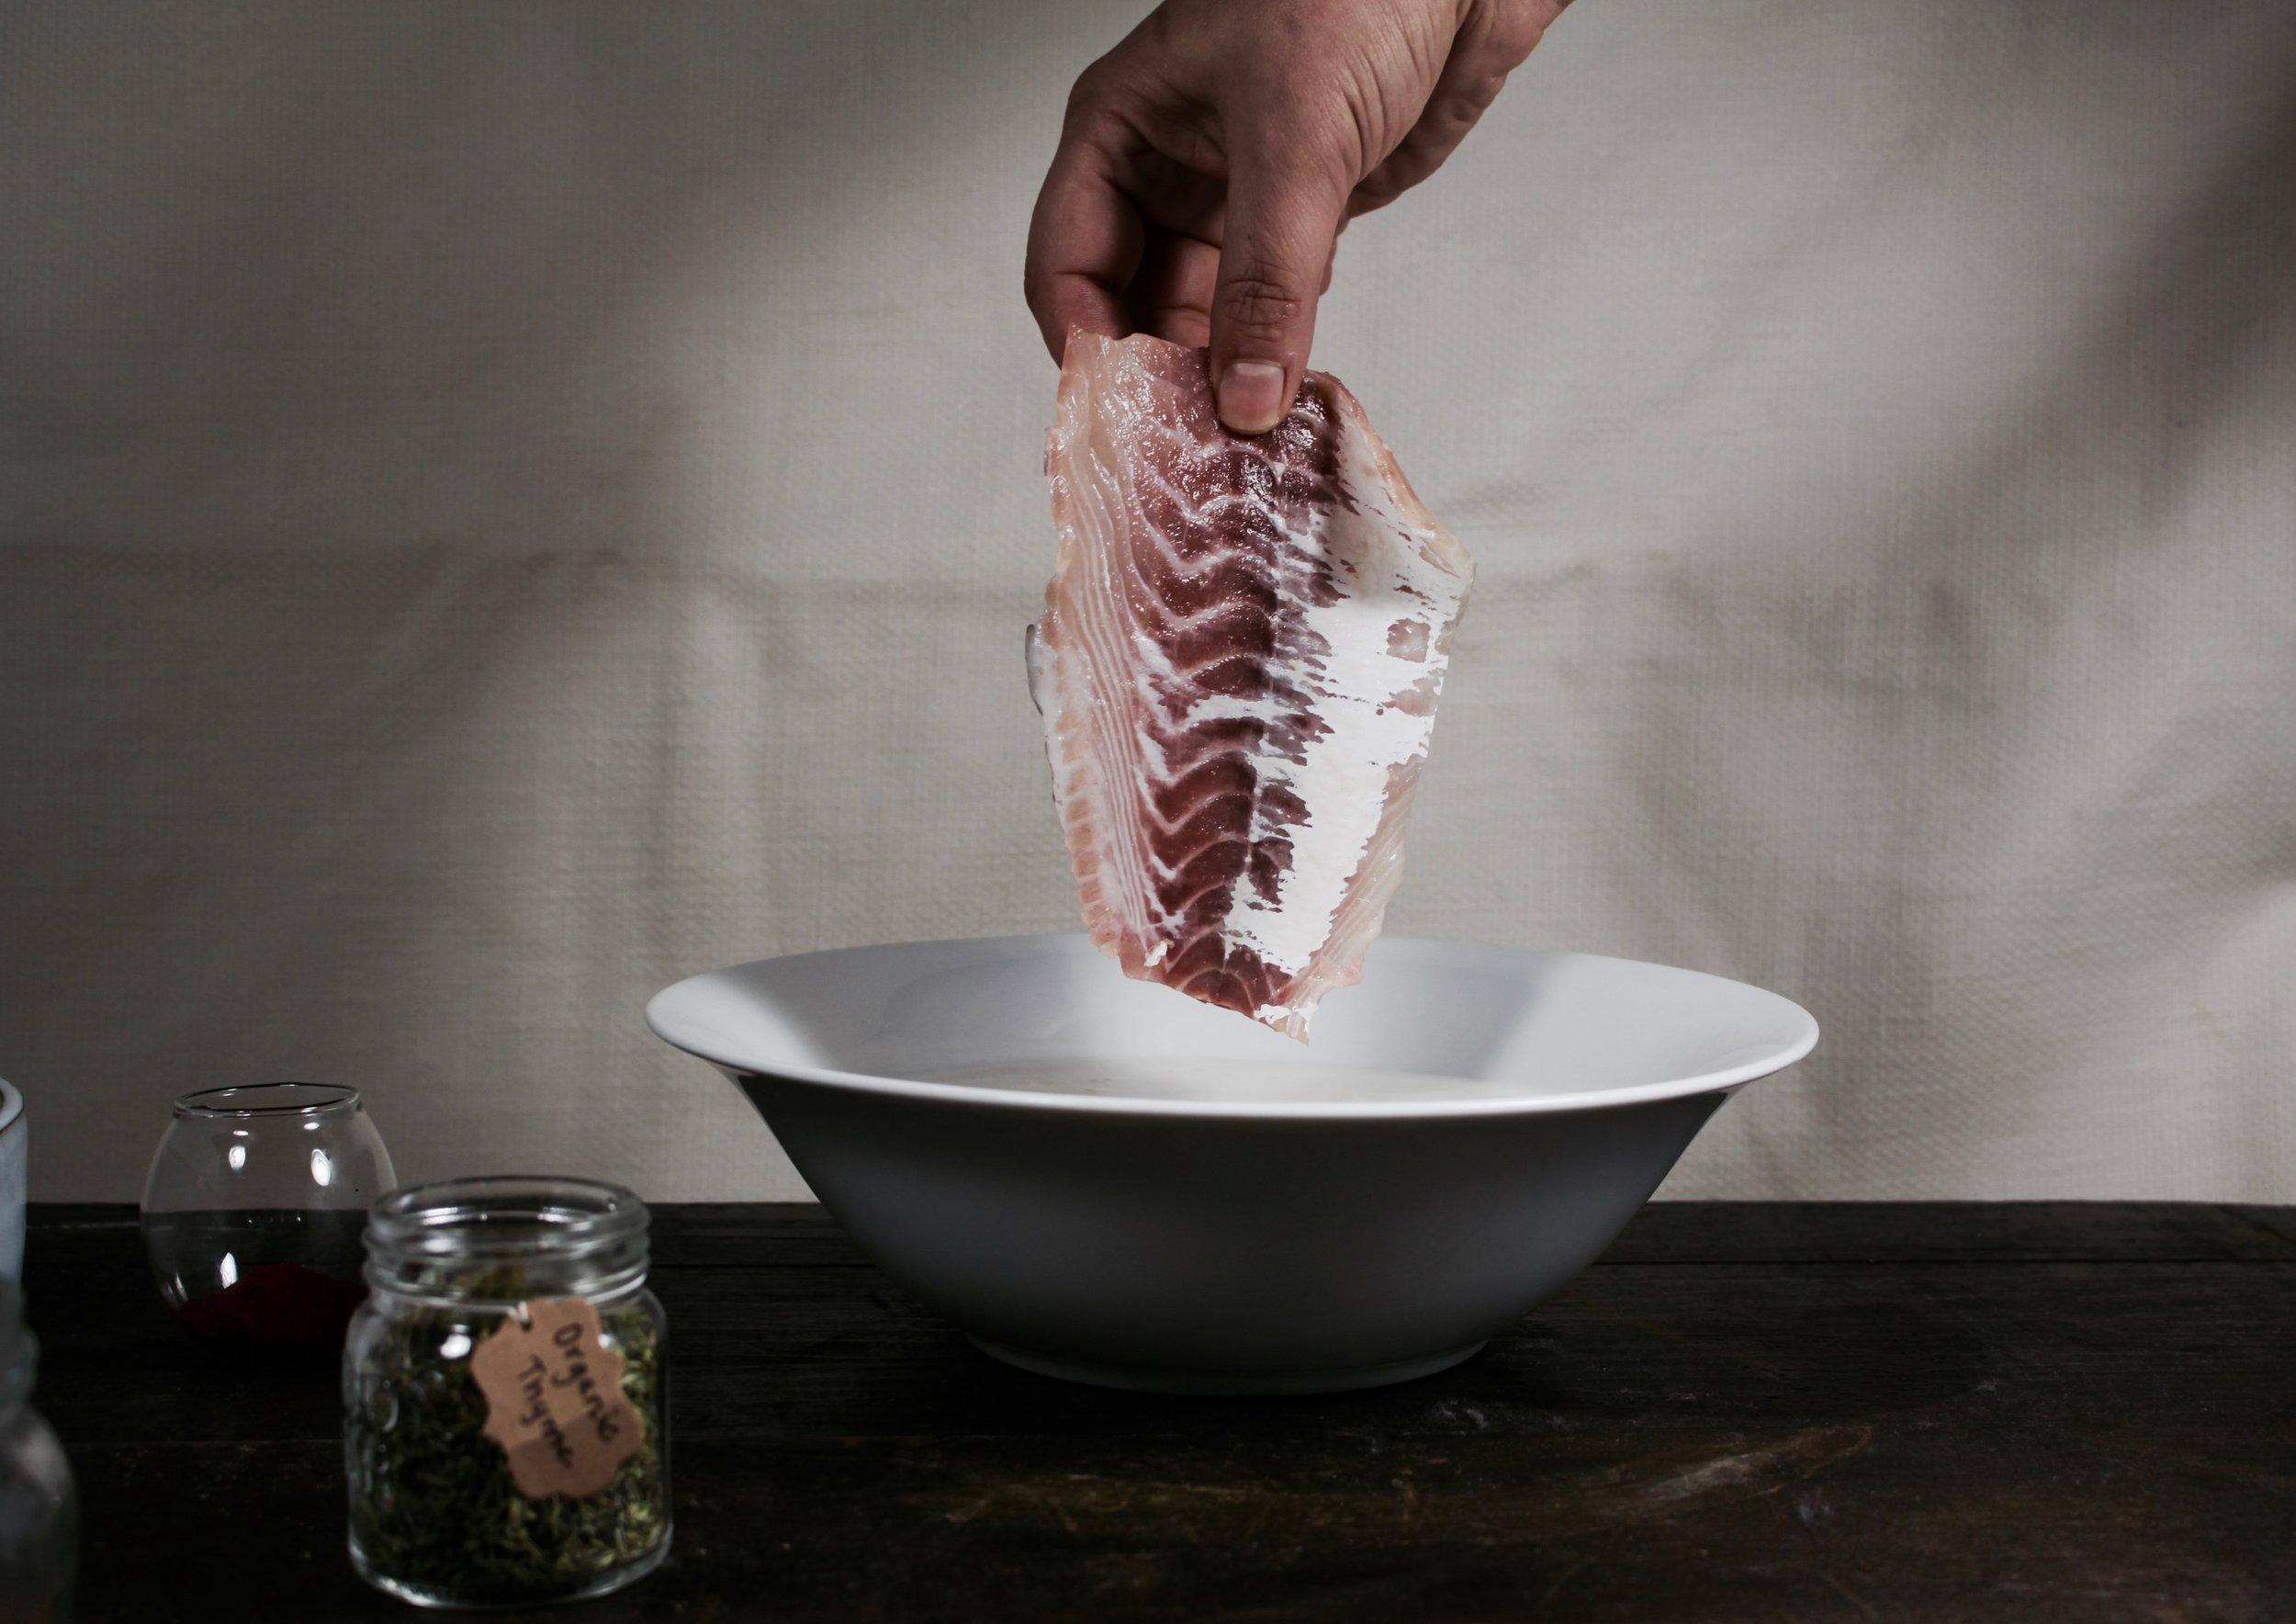 Fried Fish: Photo By Sunny Tran